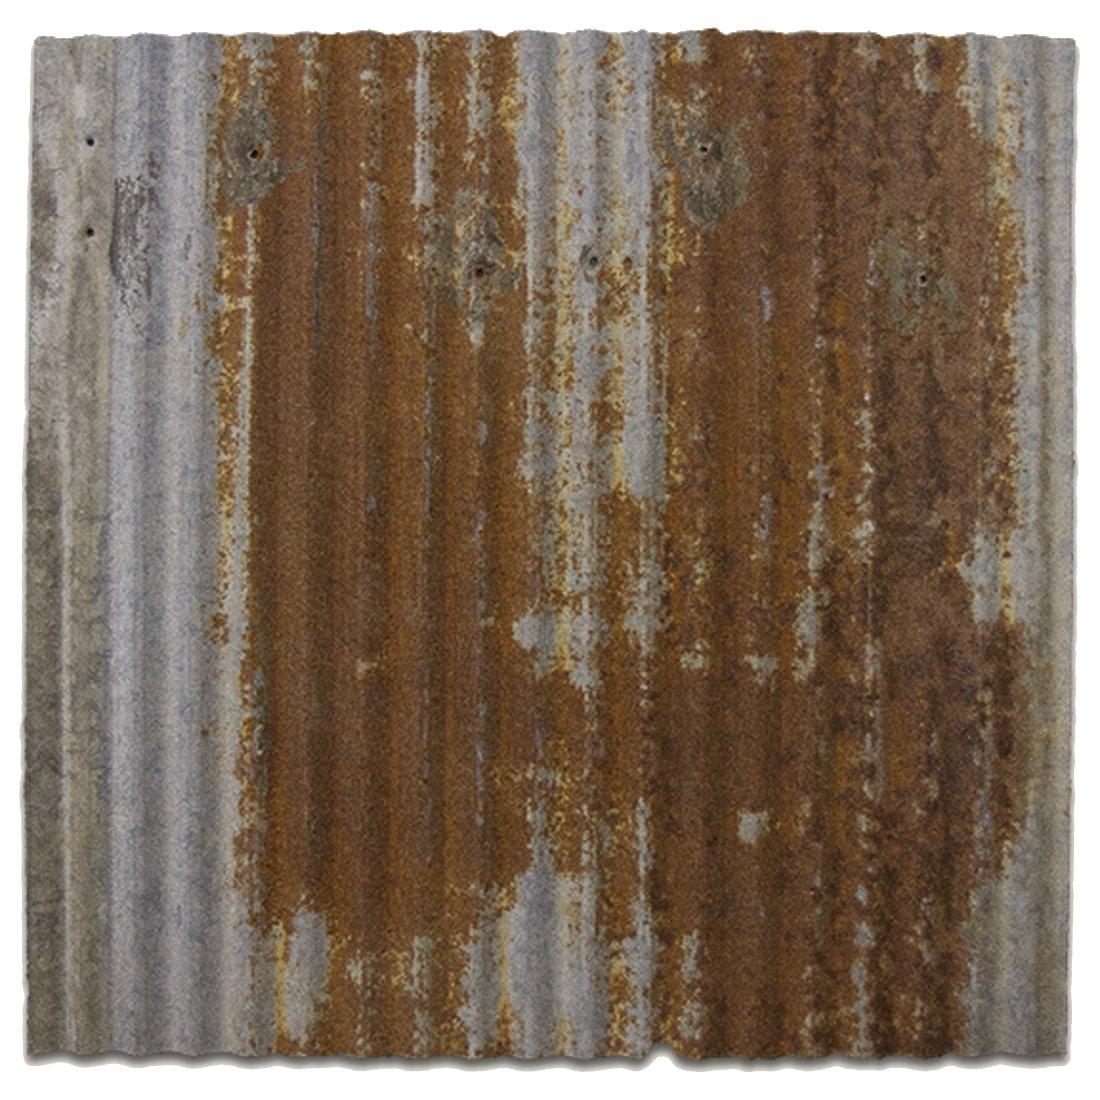 CeilingConnex Upcycled 2'x2' Dakota Barn Tin Ceiling Tile - Marjority Rust - Works with Standard Drop Grid